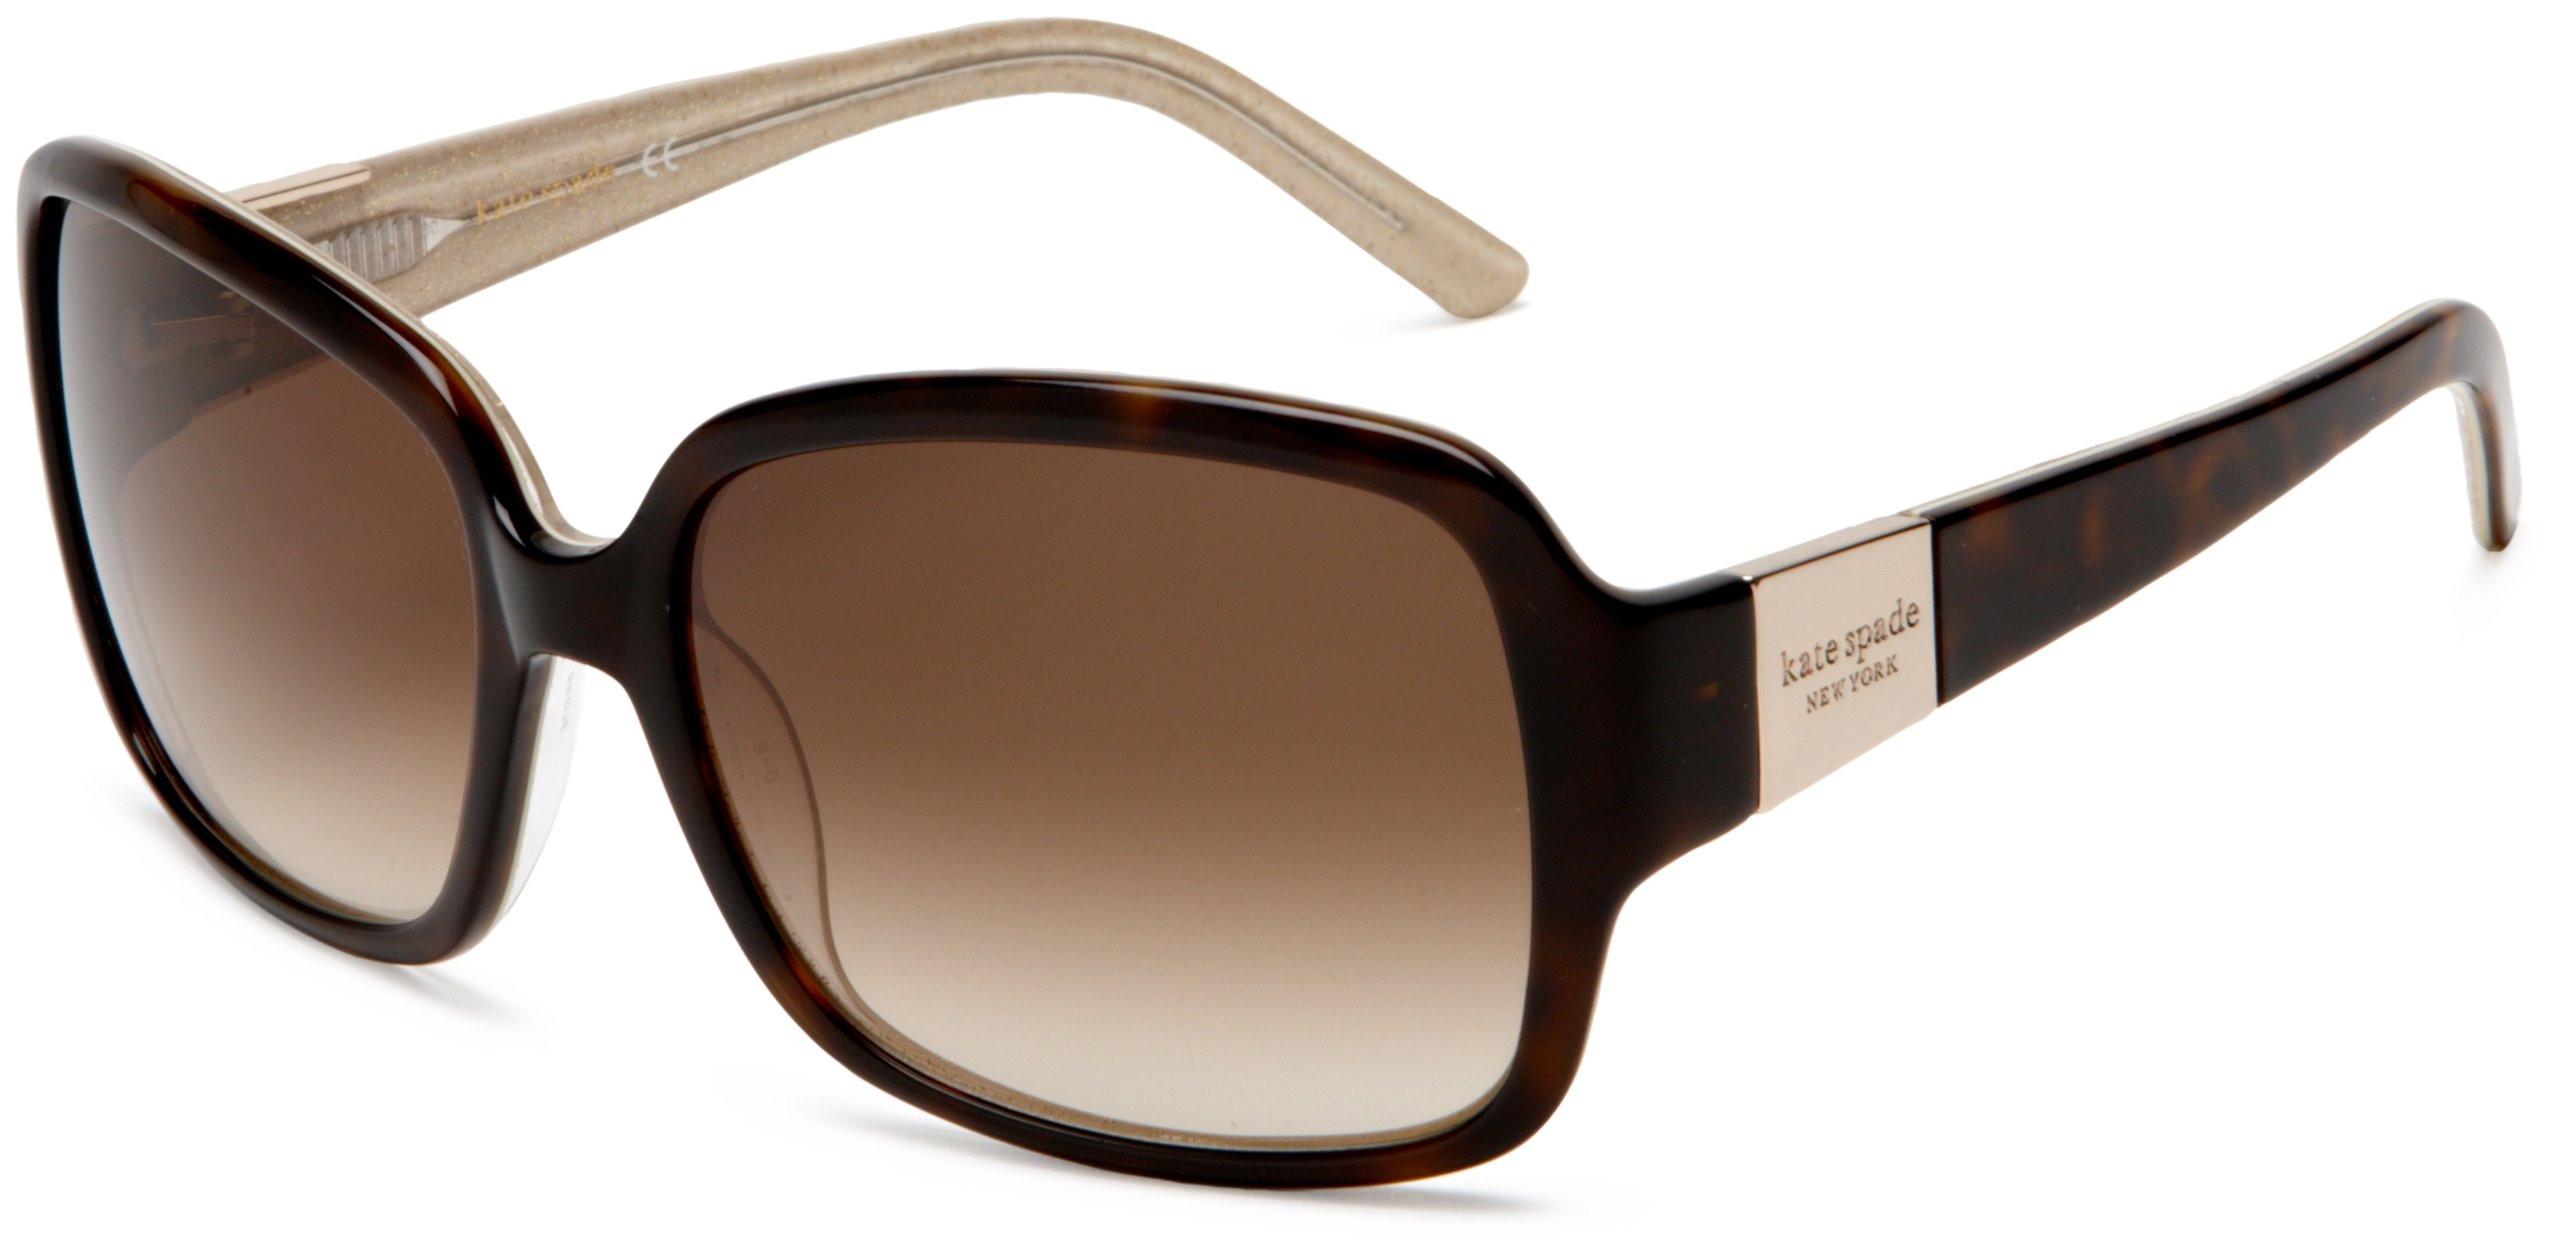 Kate Spade New York Women's Lulu Tortoise/Gold/Brown Gradient Lens Sunglasses  One Size